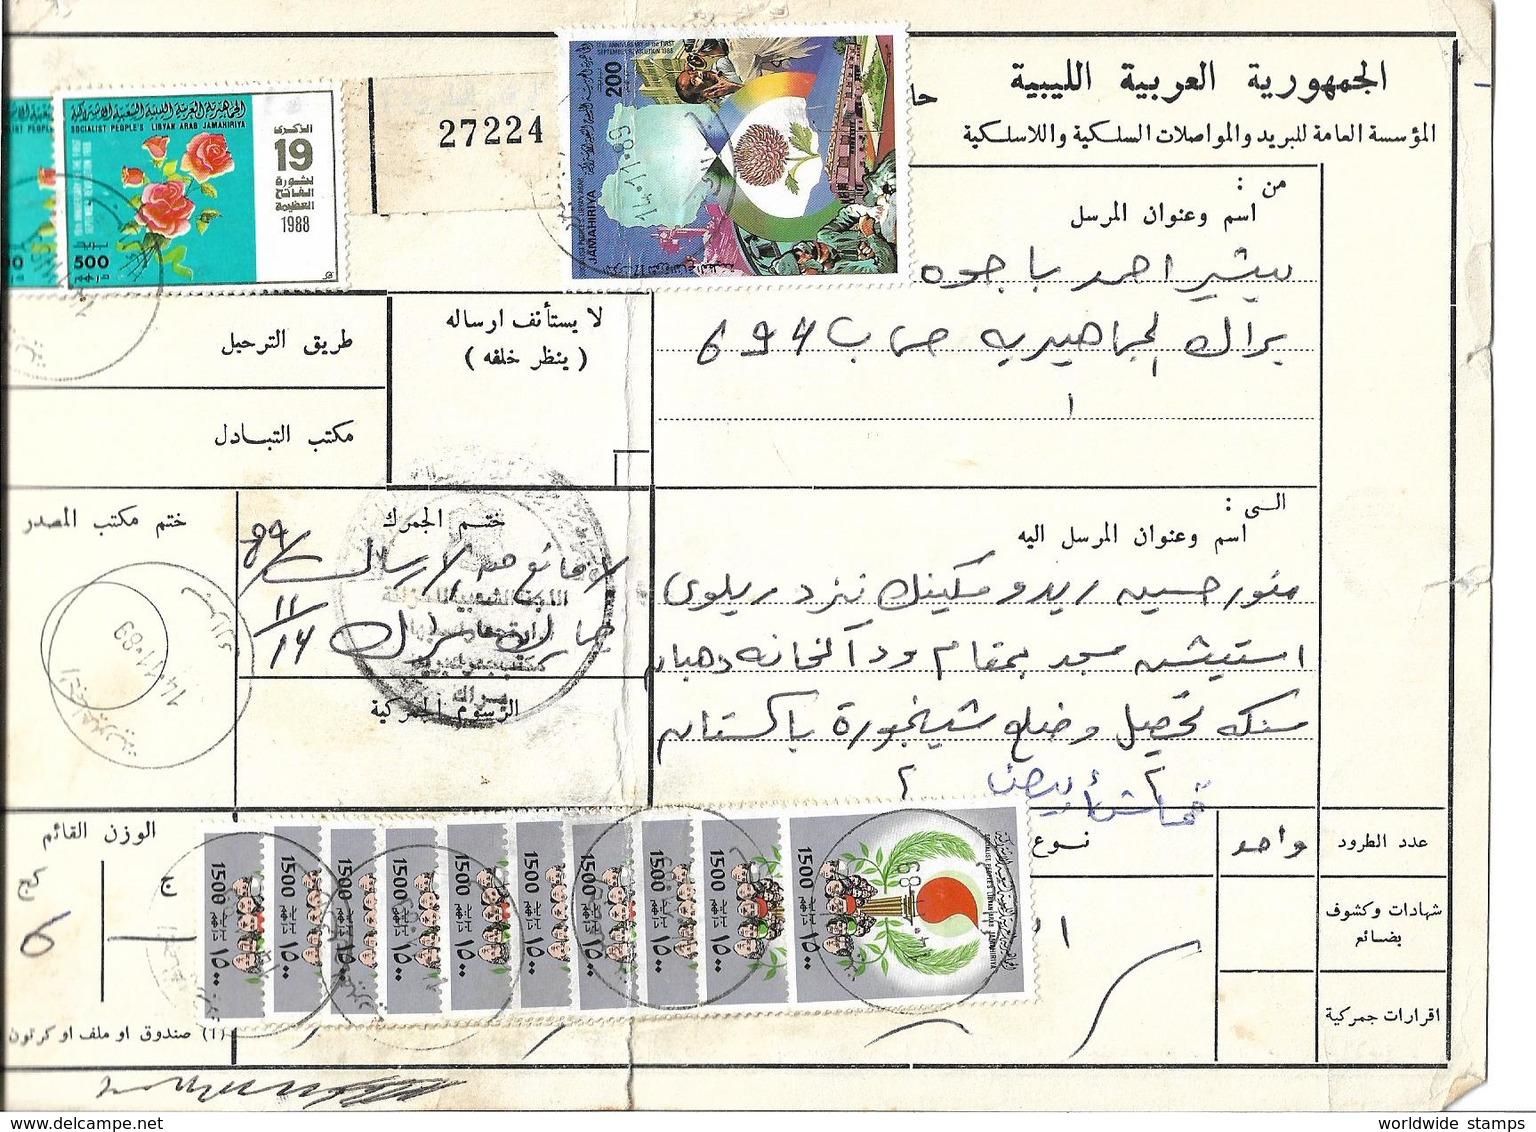 LIBYA 1995 FLOWER, LIBYA 1986 SEPTEMBER 1st REVOLUTION ANNIVERSARY, 1979 Torch And Olive Branch On Parcel Card - Libië